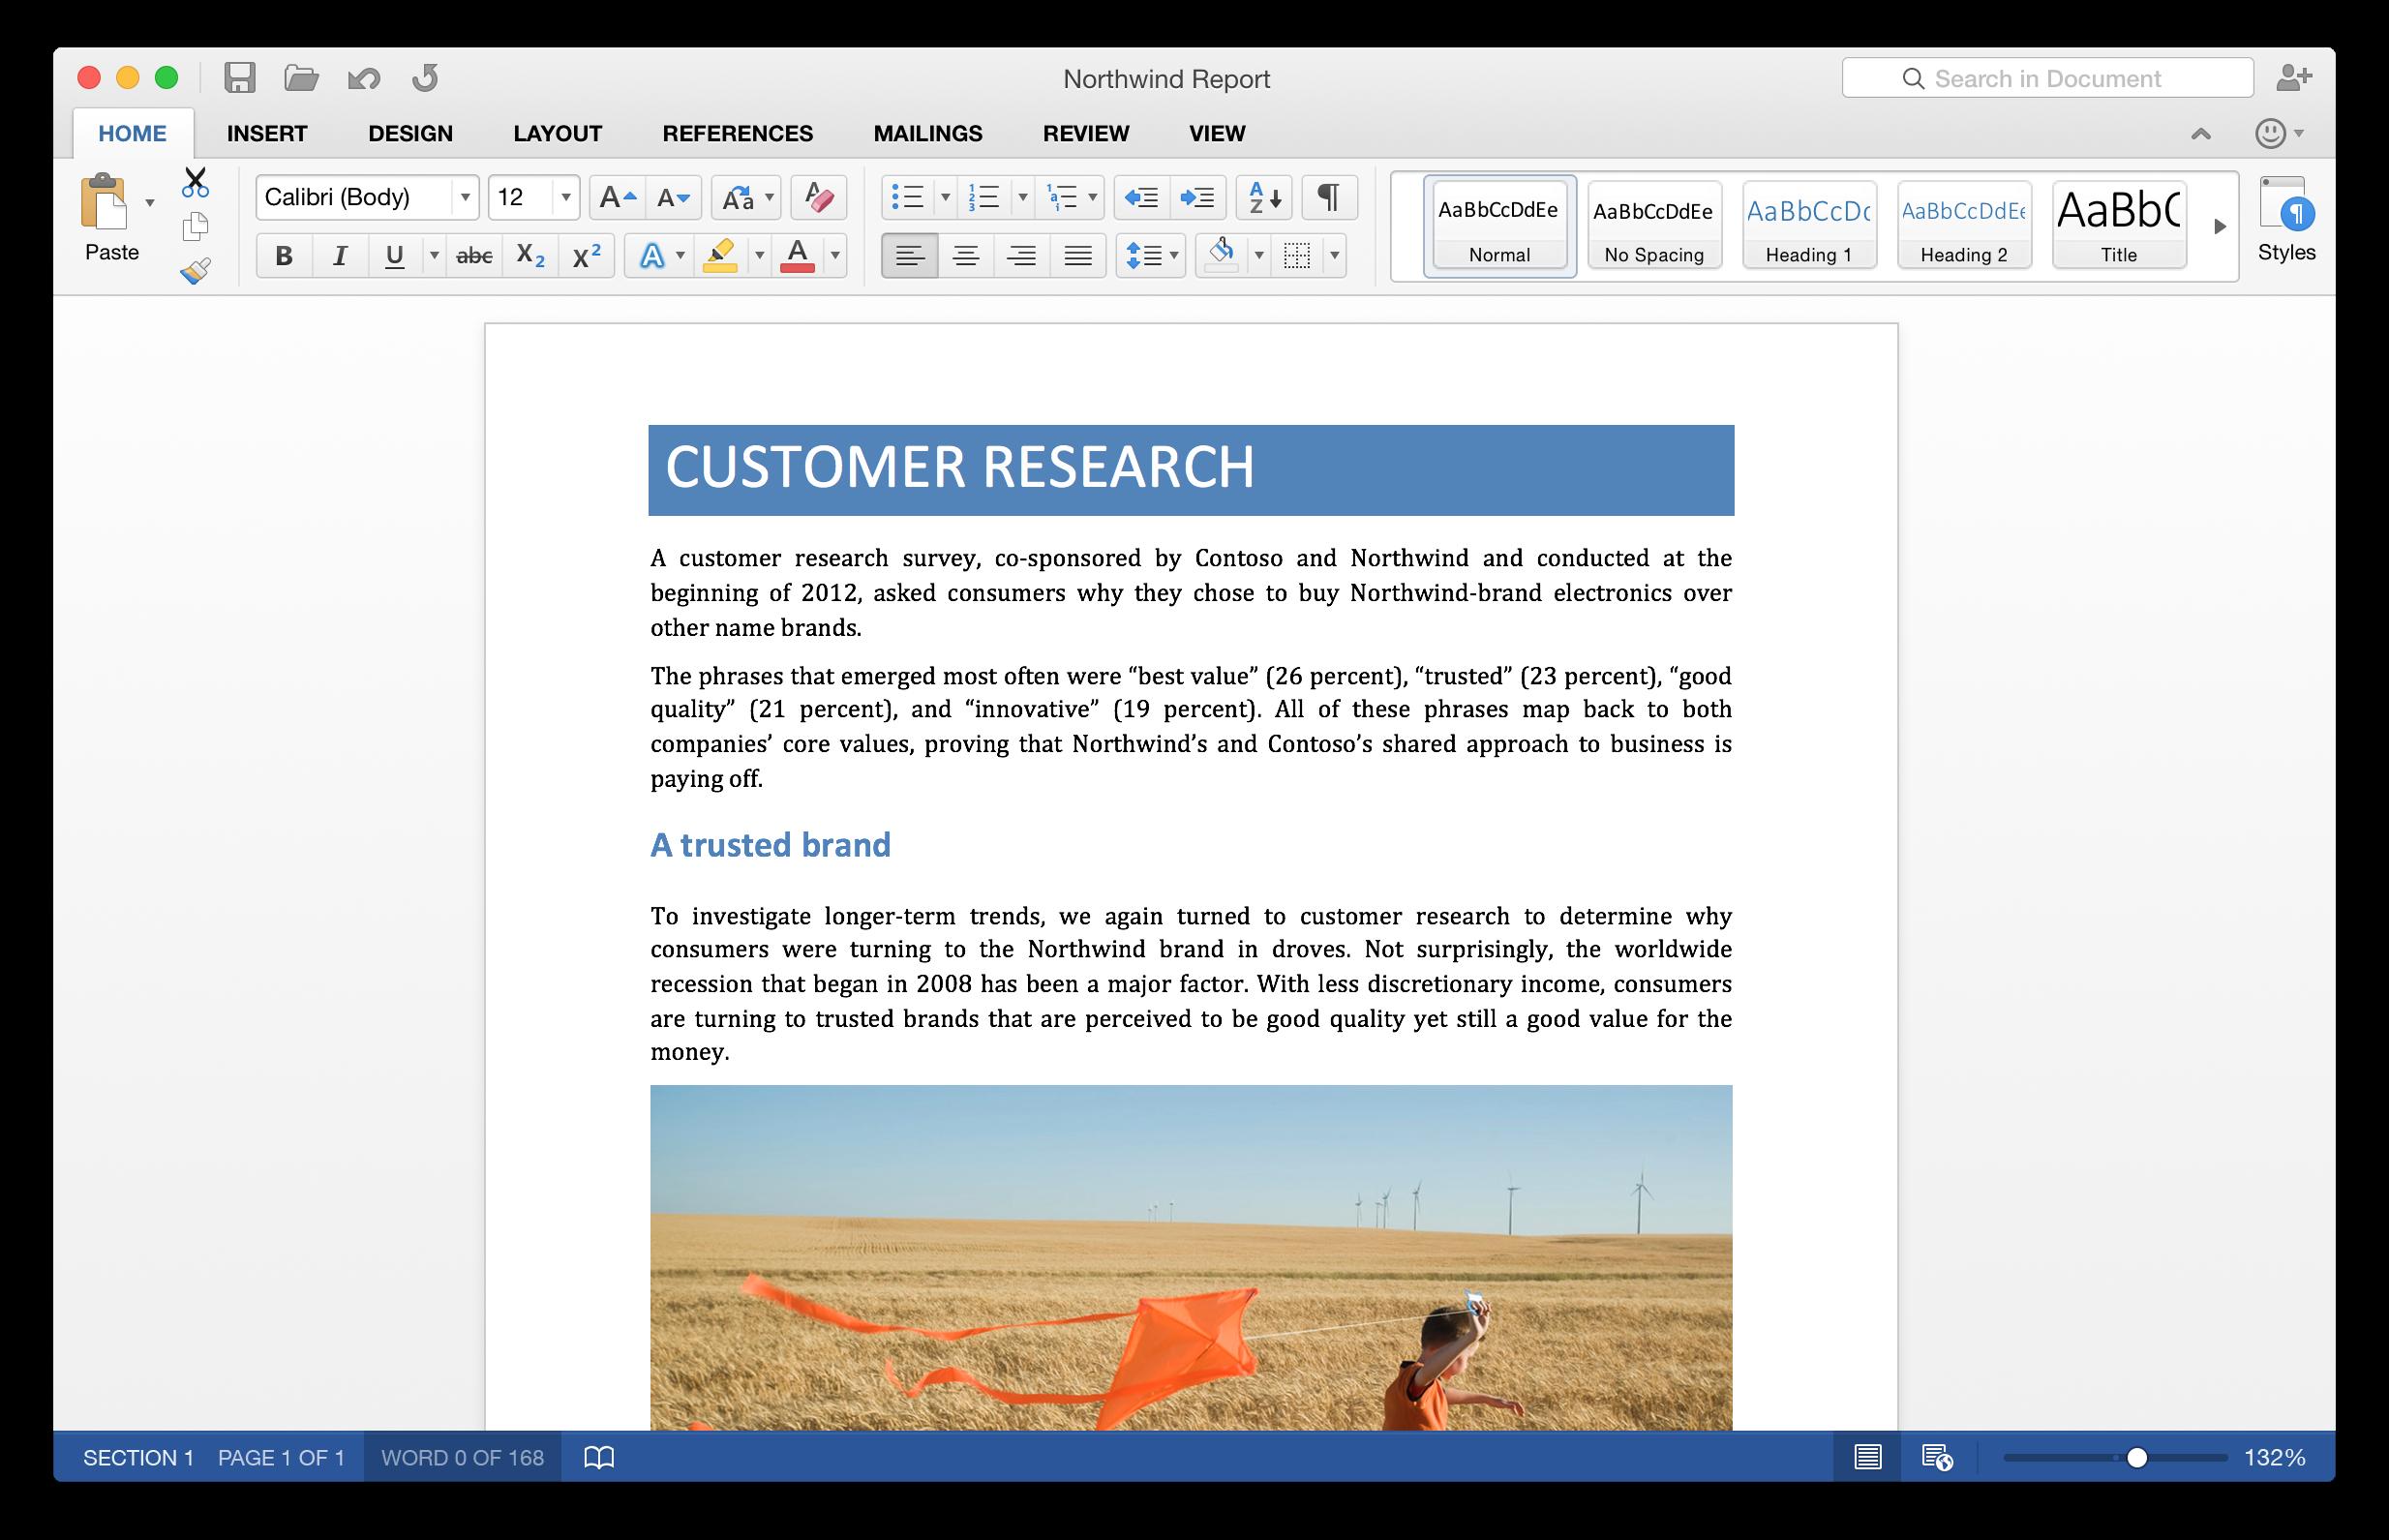 [MAC] Microsoft Office for Mac 2016 VL v16.16.15 macOS - Ita